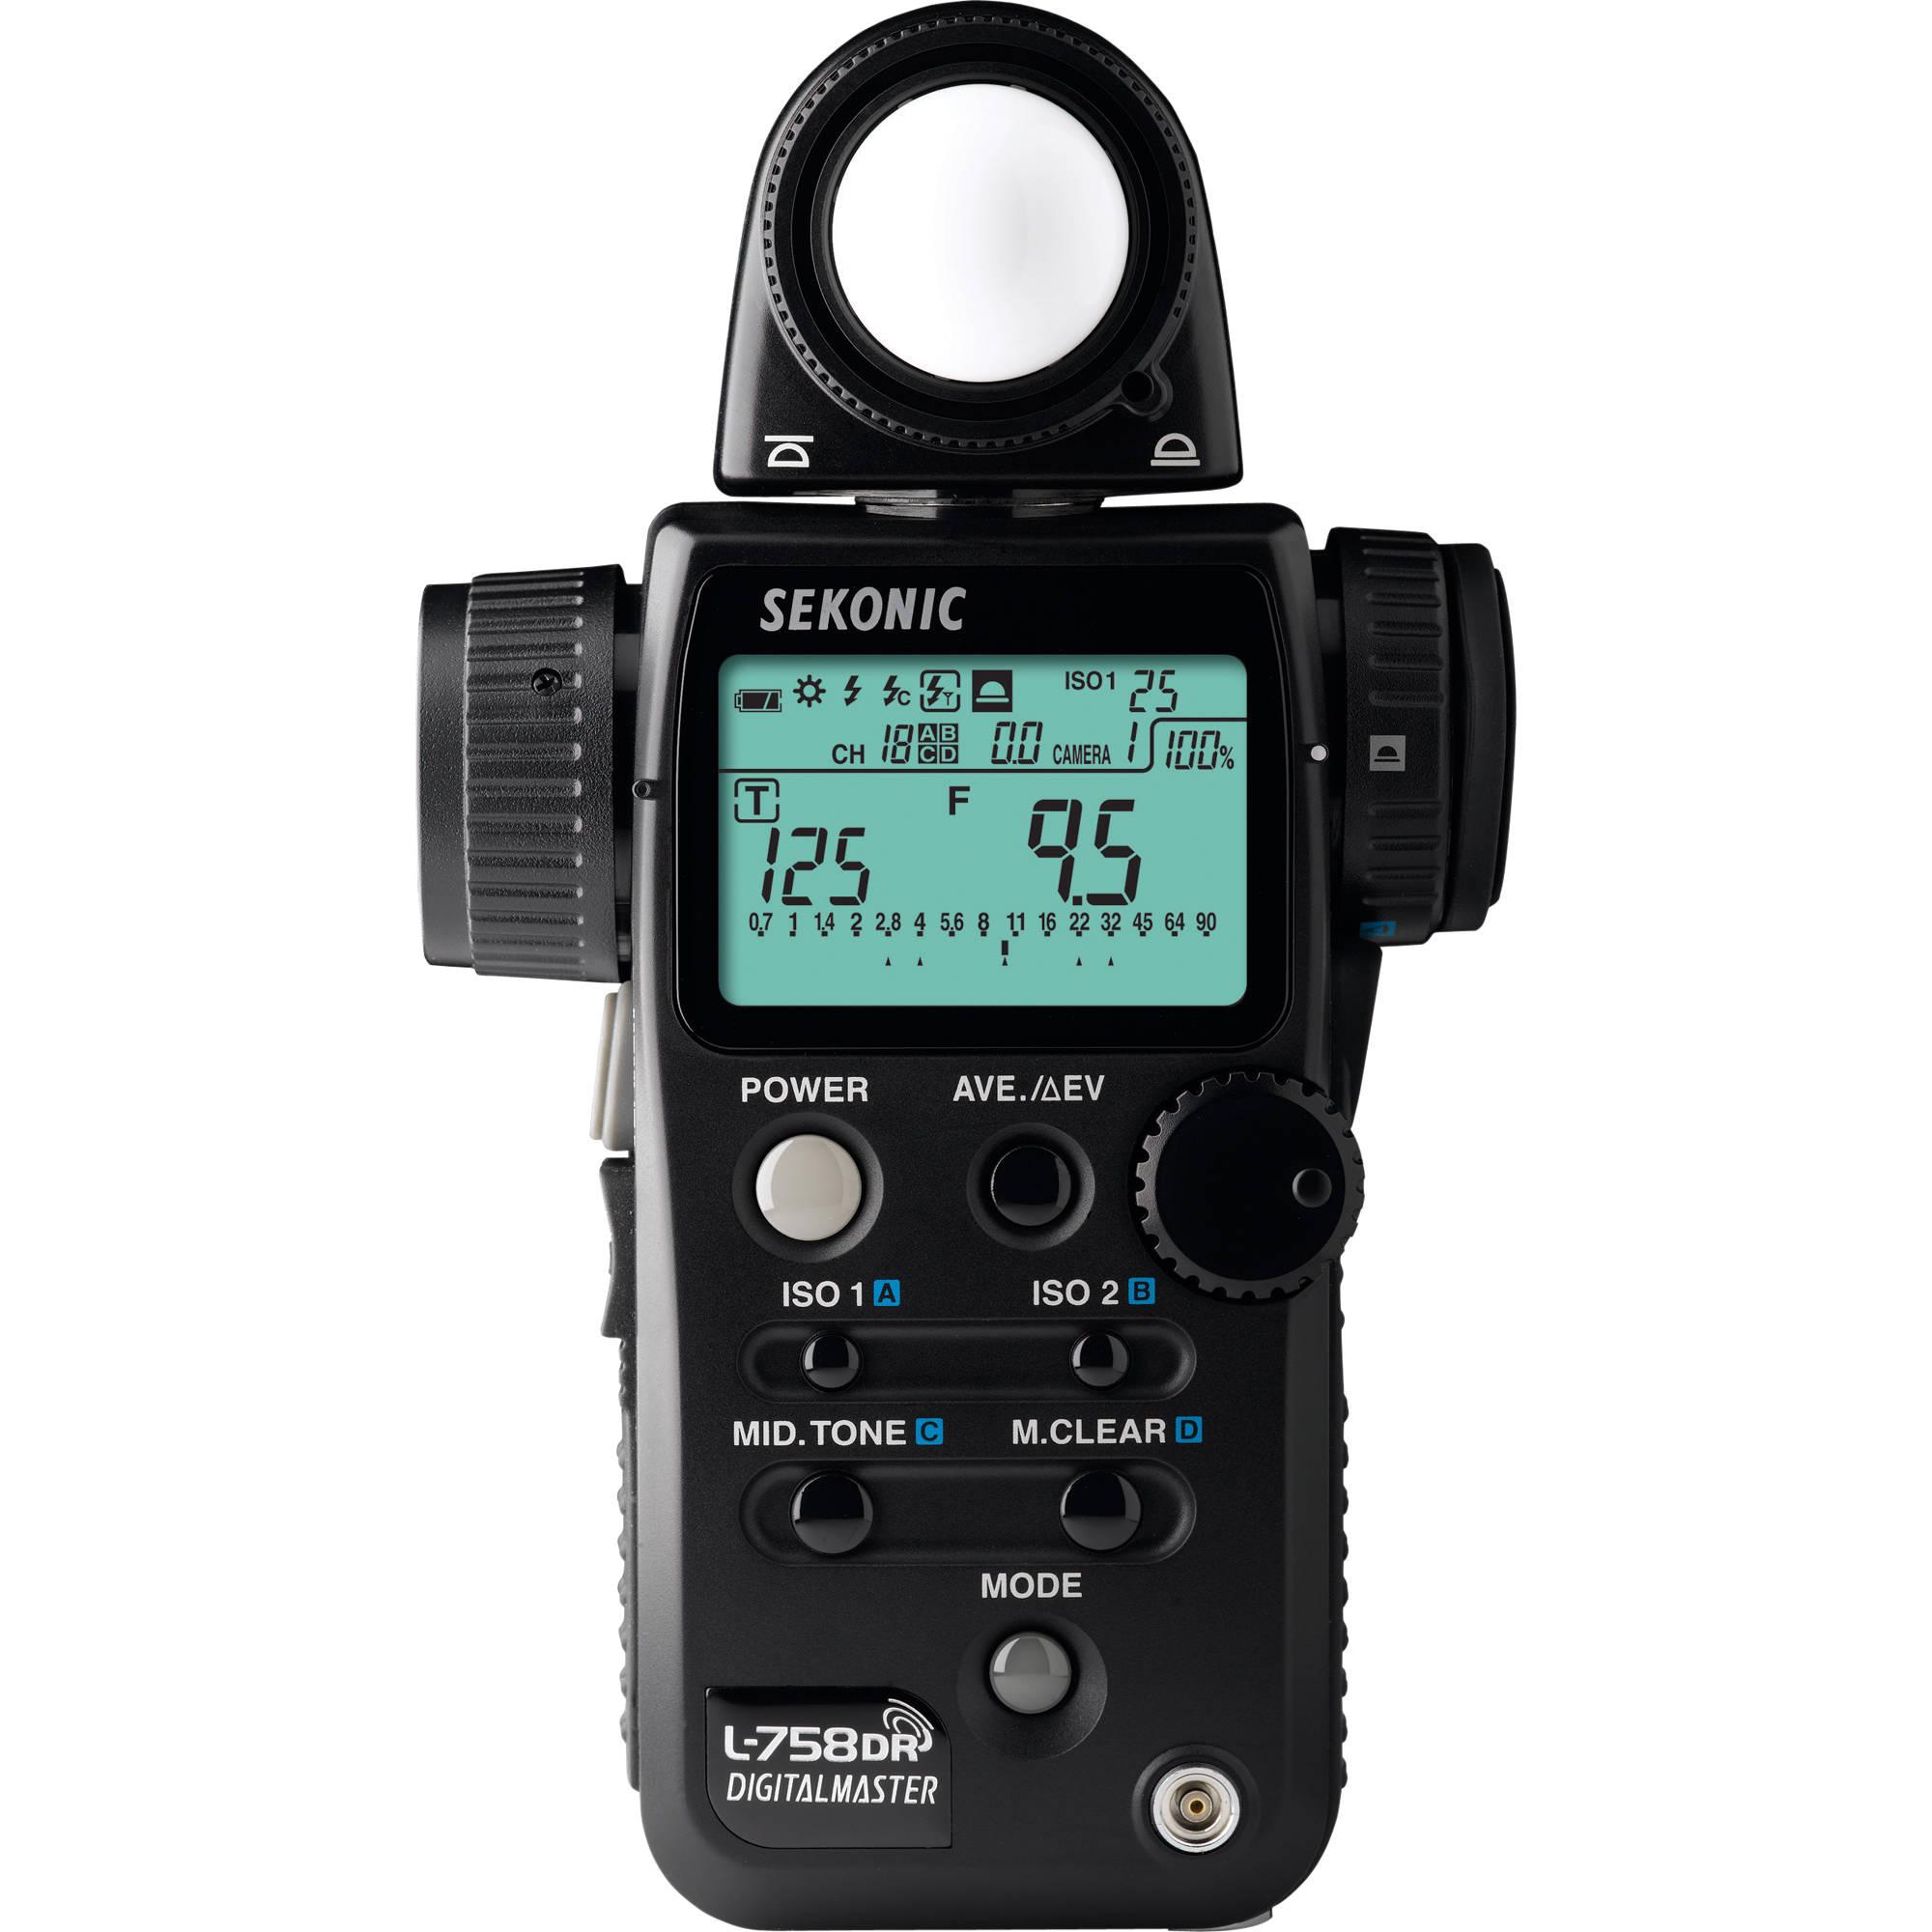 Sekonic L-508 Flashmeter - 15€/Day